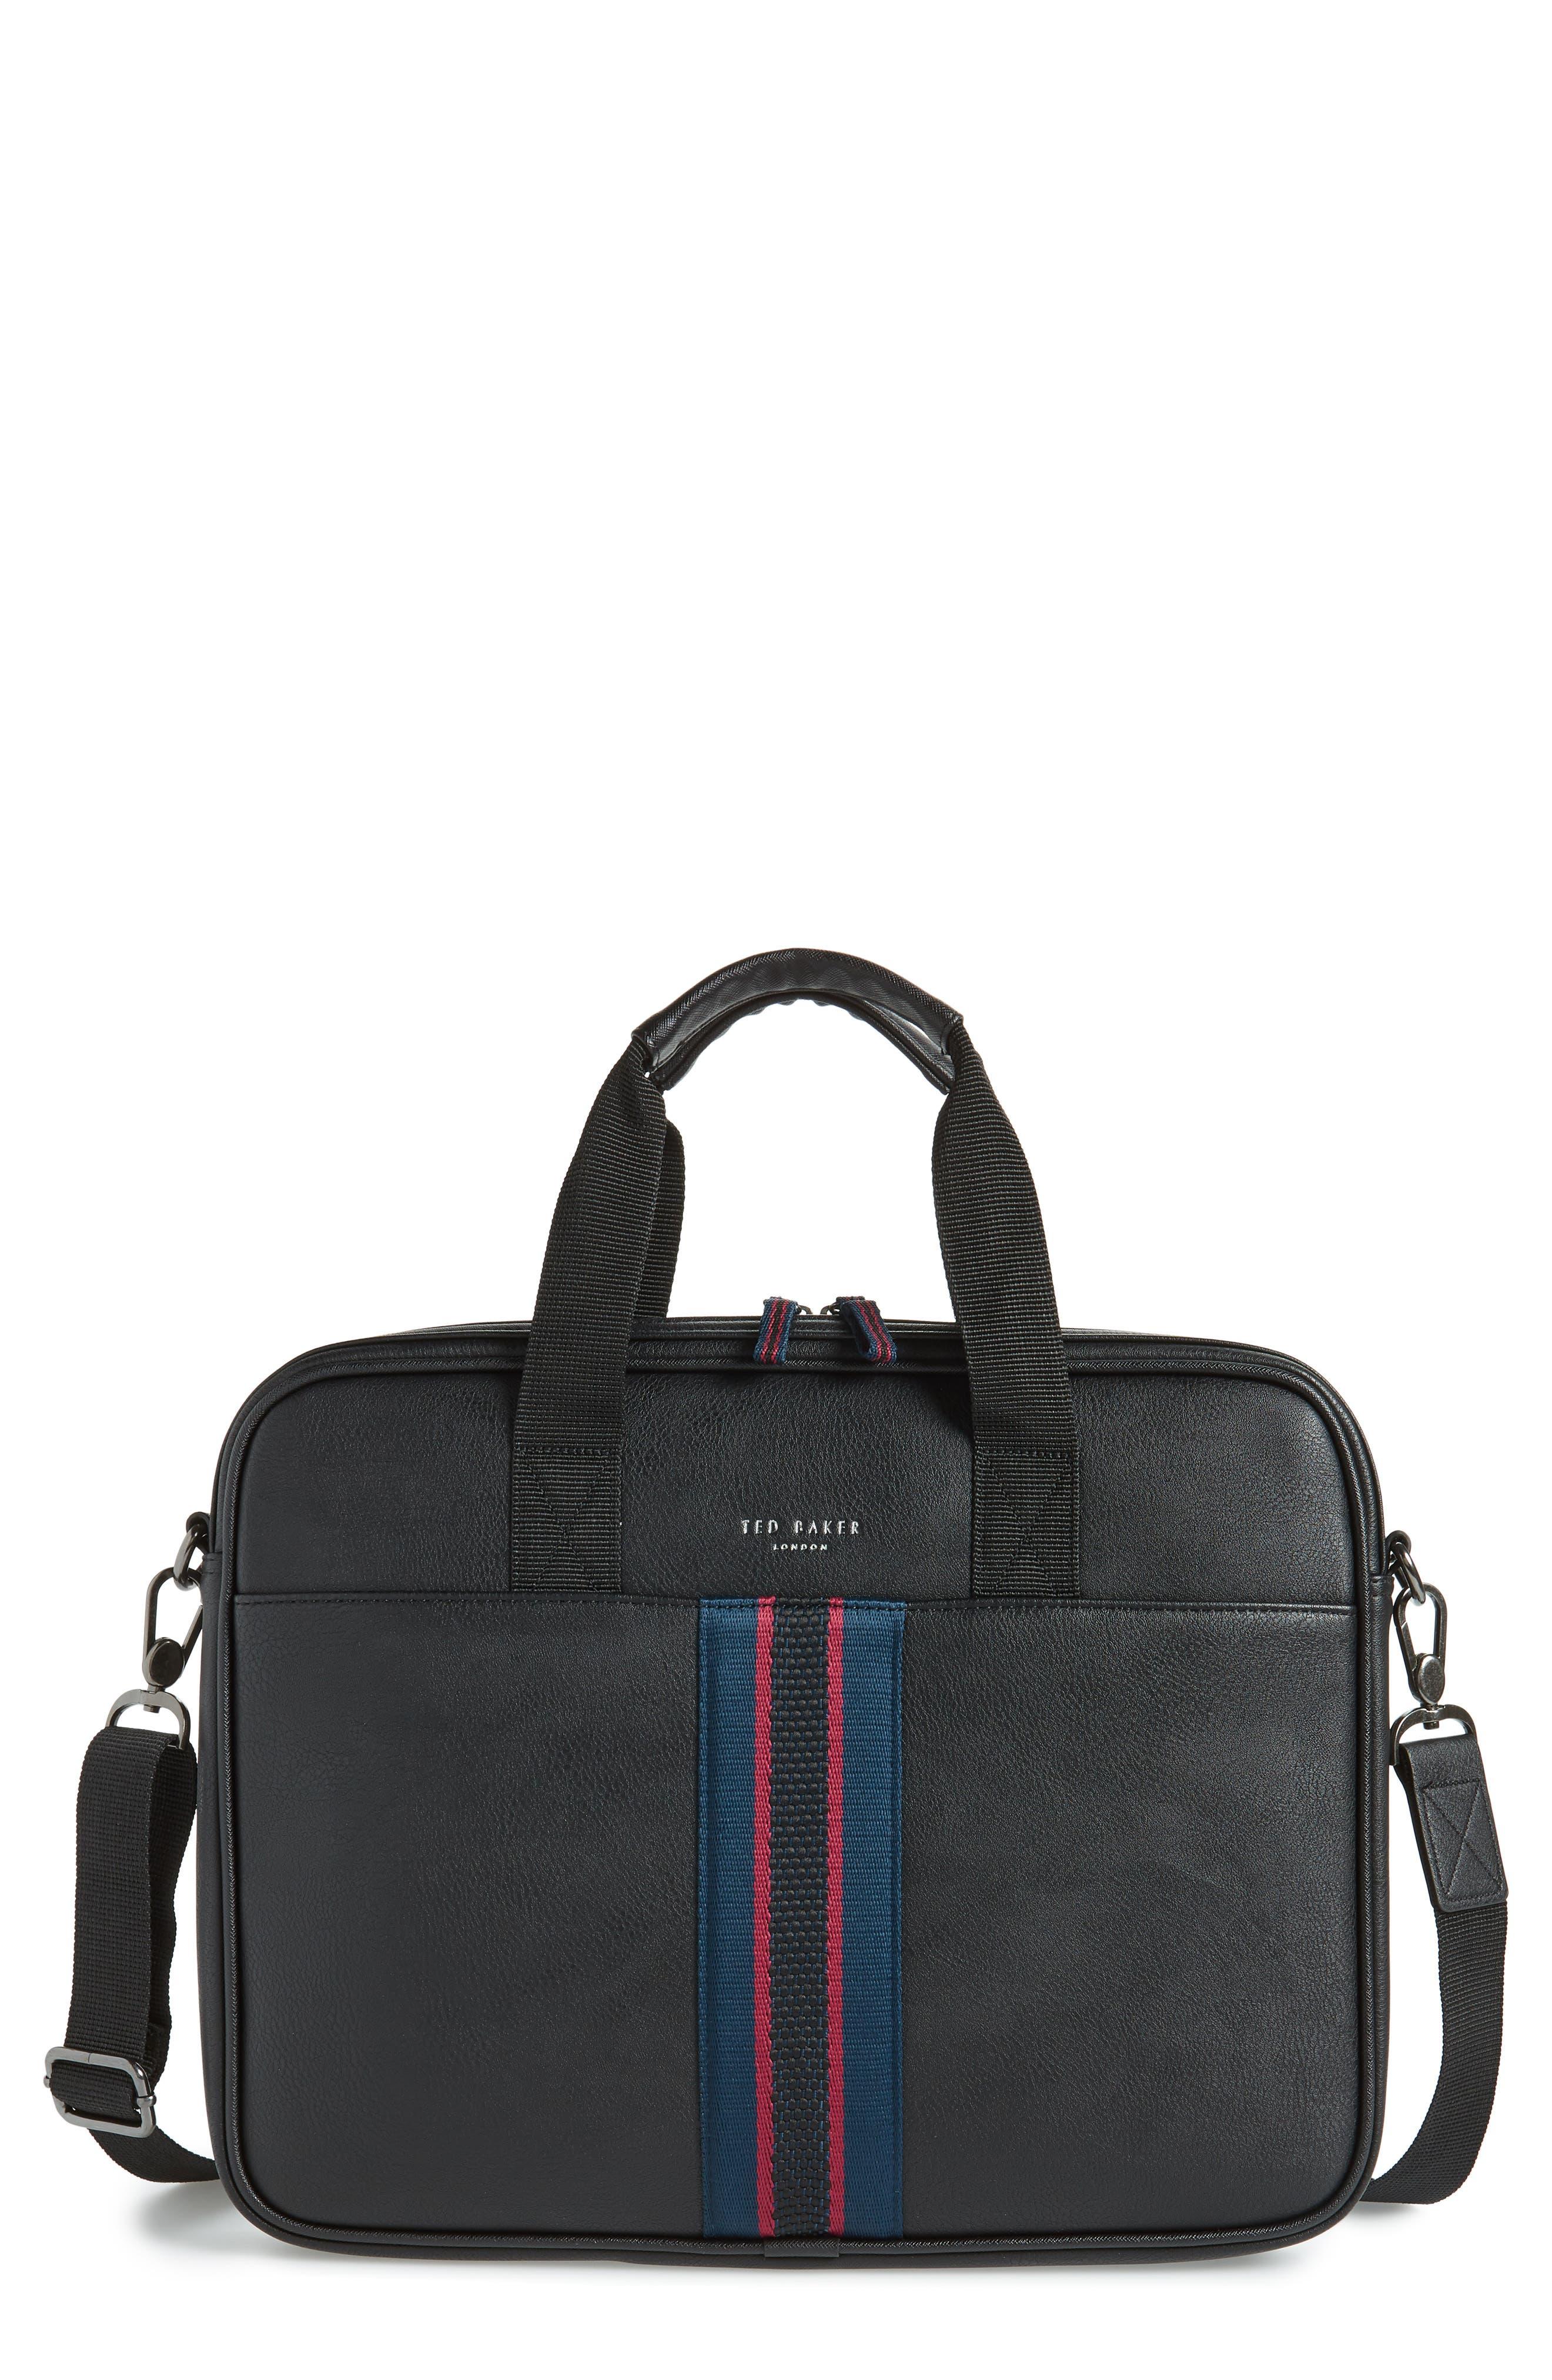 TED BAKER LONDON, Faux Leather Document Bag, Main thumbnail 1, color, BLACK